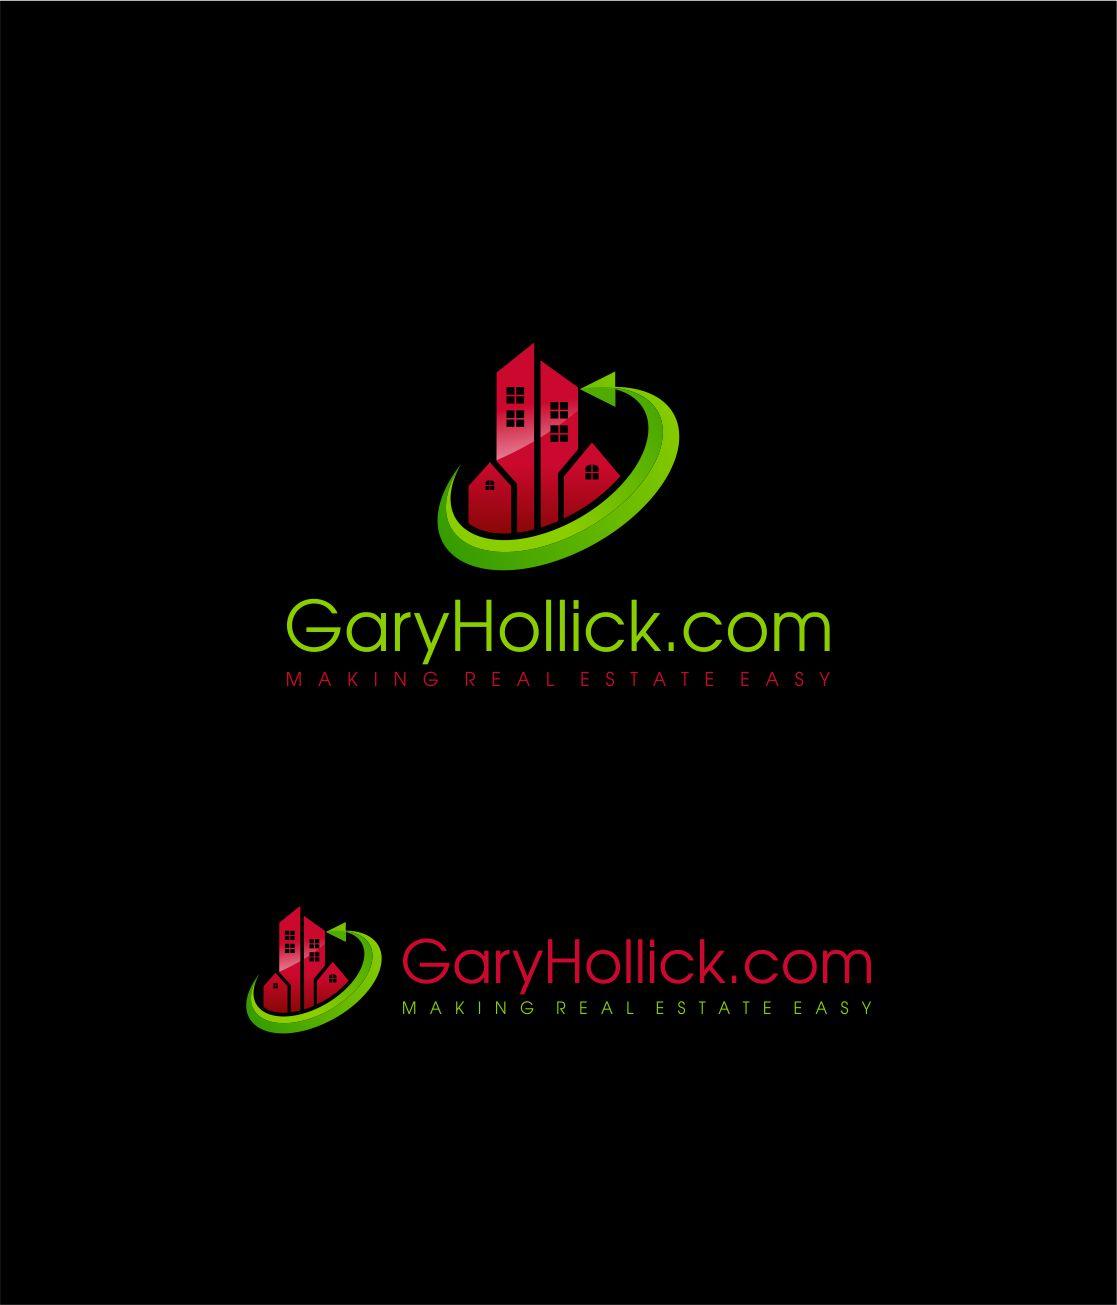 Logo Design by Raymond Garcia - Entry No. 3 in the Logo Design Contest New Logo Design for GaryHollick.com.